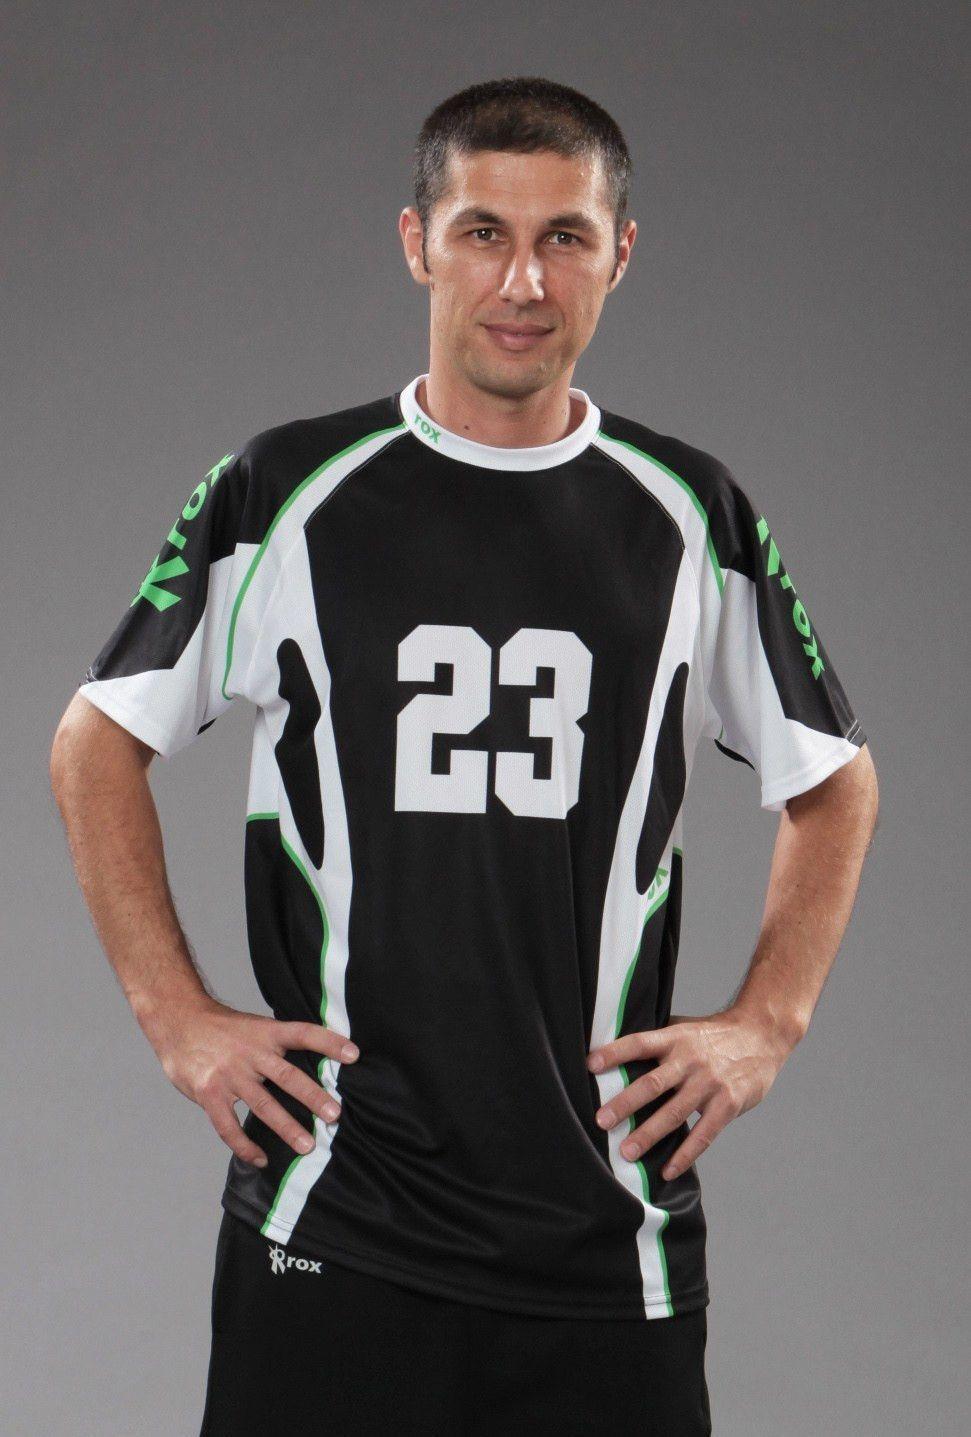 Phantom Mens Sublimated Jersey Jersey Fantasy Football Fantasy Football Shirt